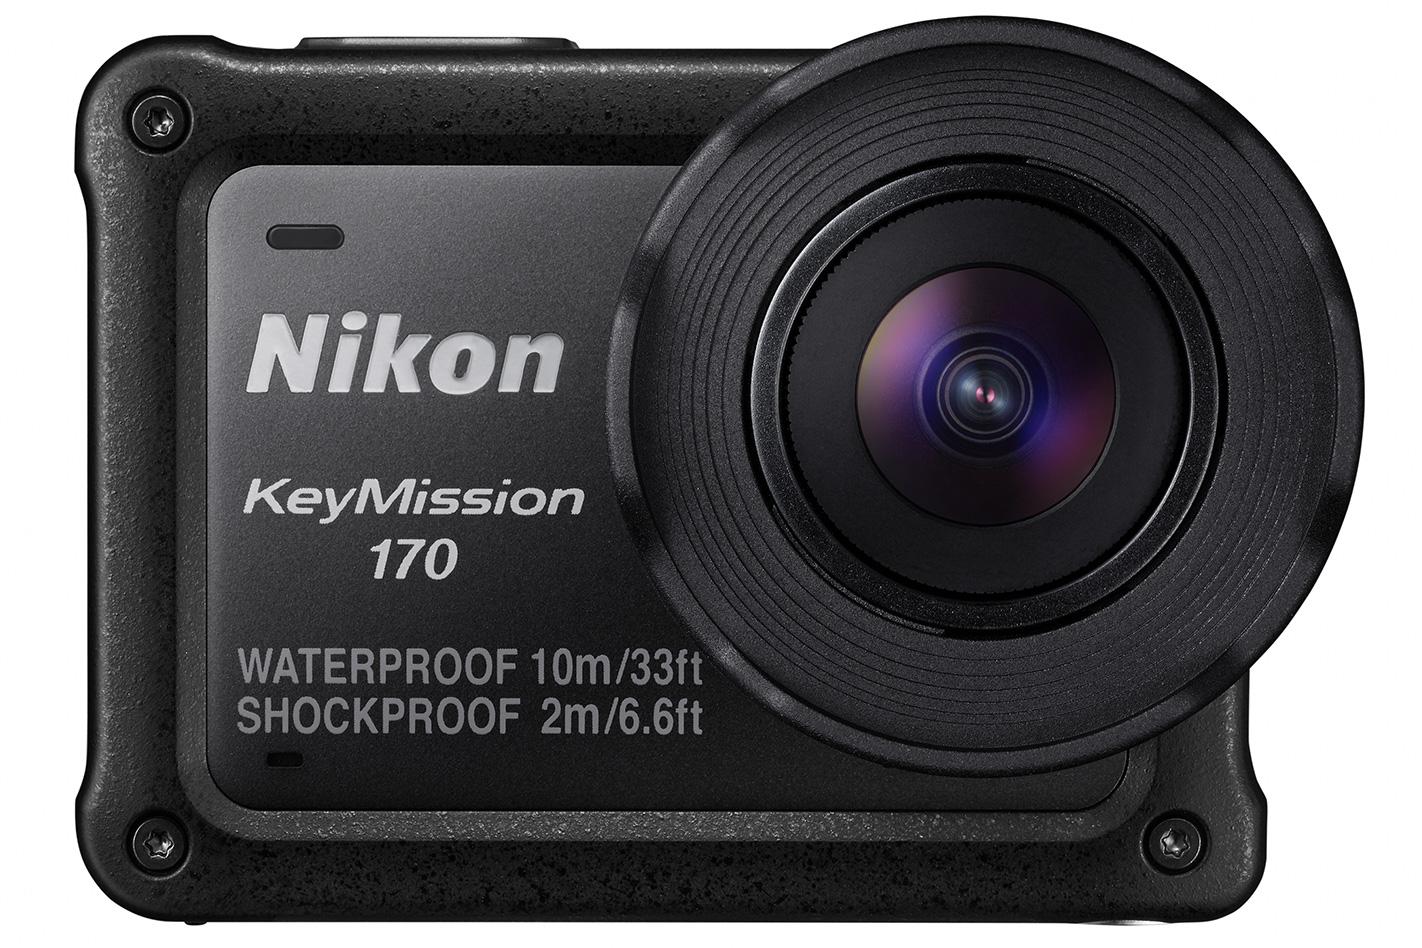 Nikon KeyMission 170 camera